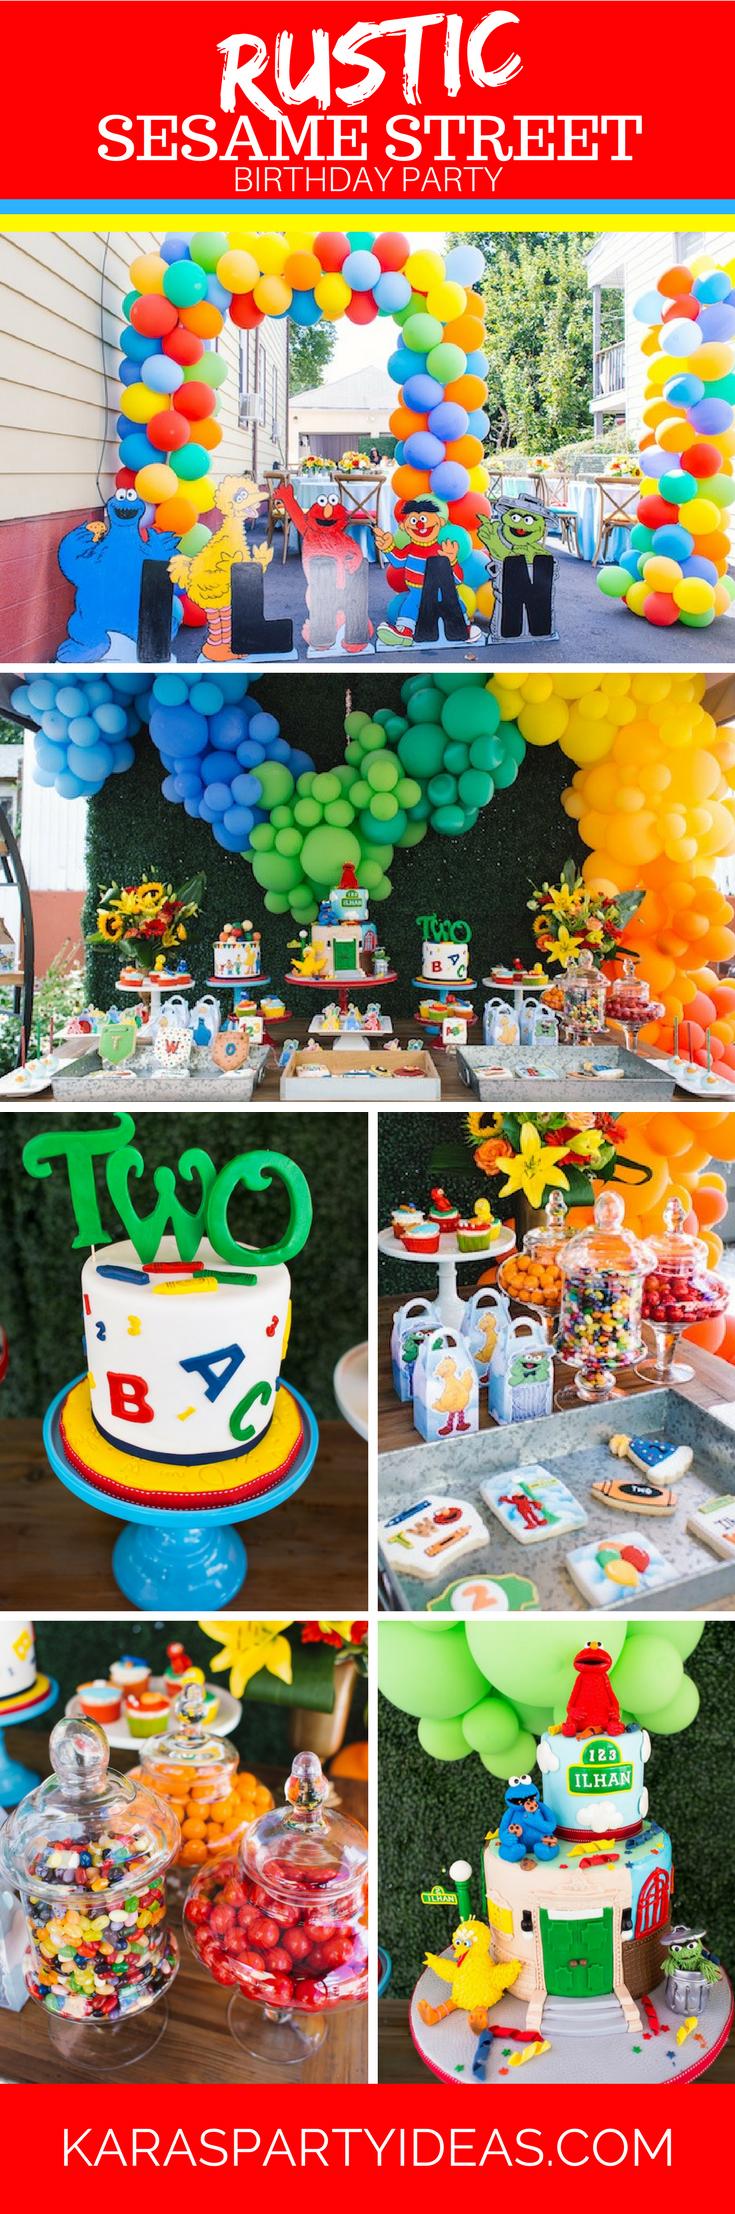 Rustic Sesame Street Birthday party via Kara's Party Ideas